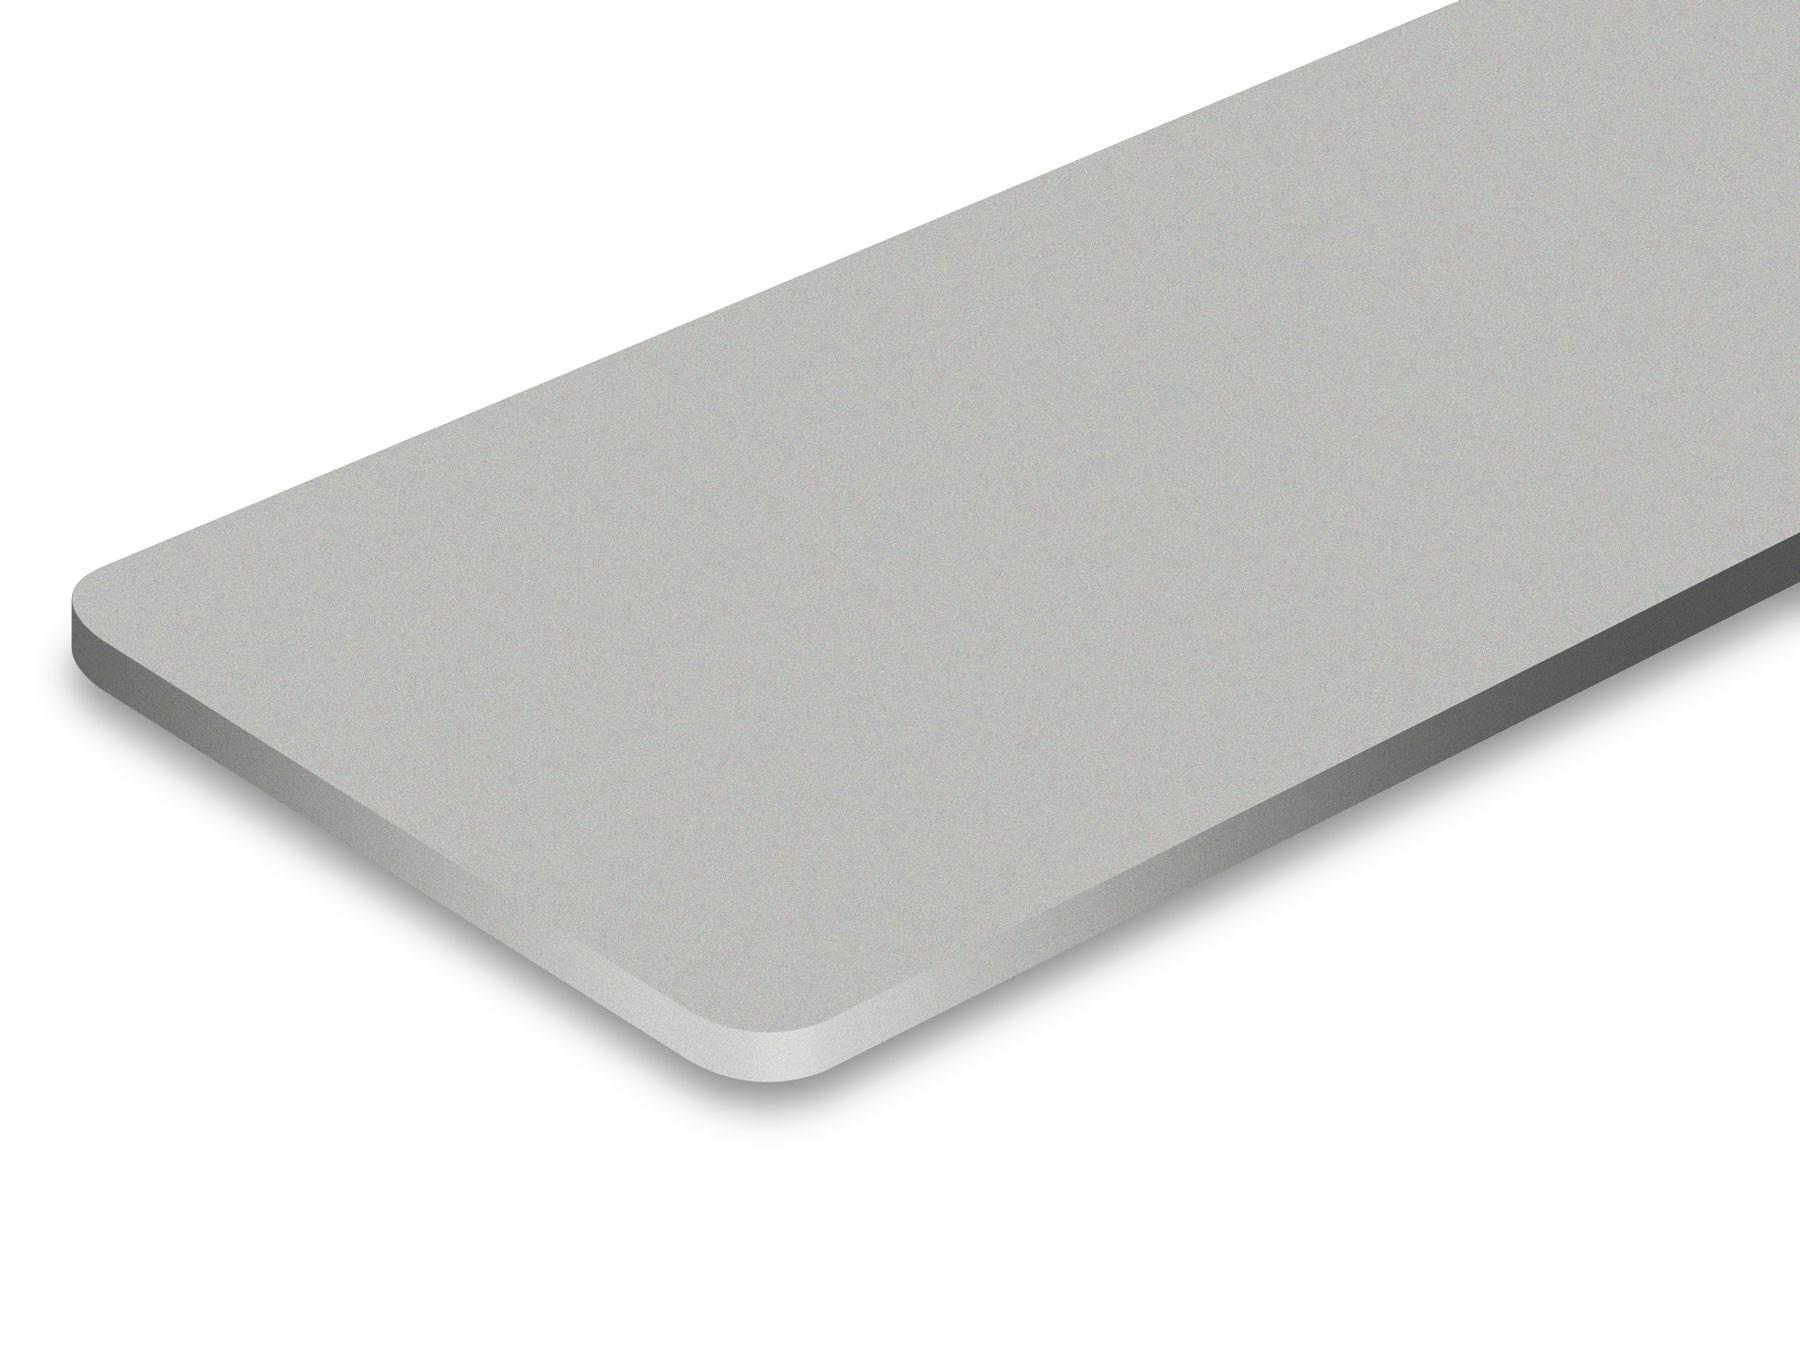 LS304-106 Silver 1,6mm